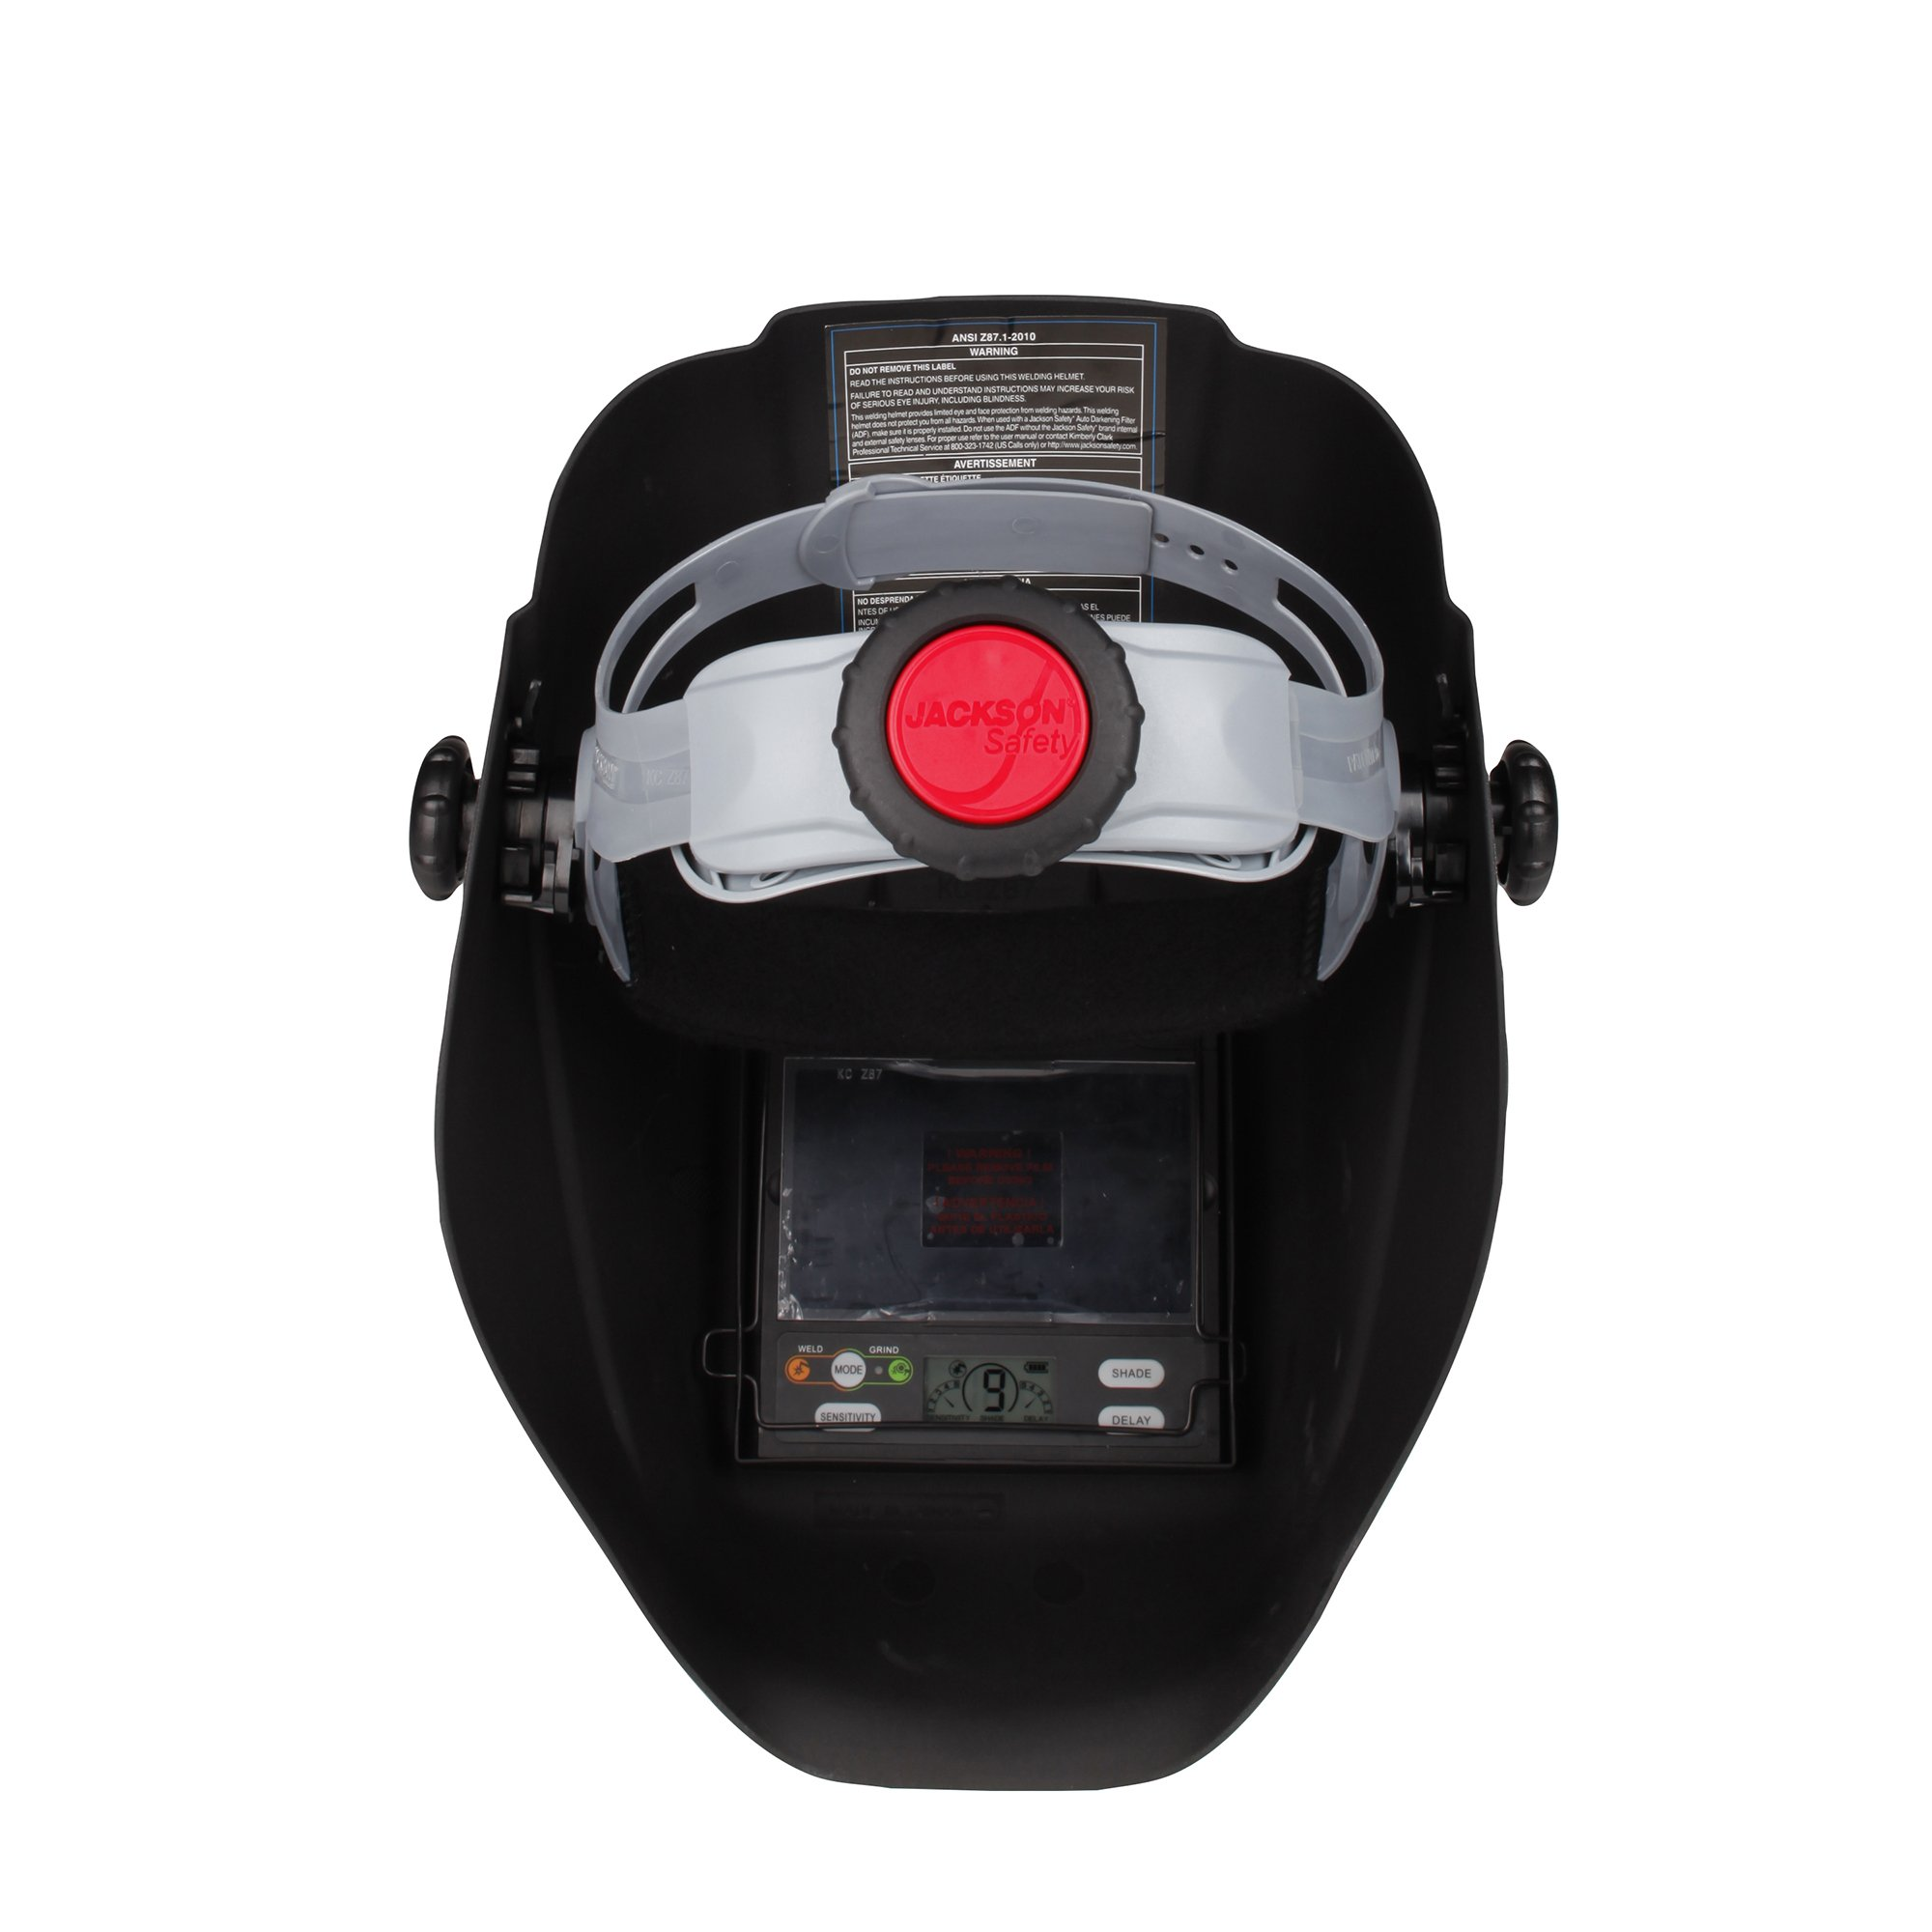 Jackson Safety Insight Variable Auto Darkening Welding Helmet, HaloX (46130), Arc Angel, 1 Helmet / Order by Jackson Safety (Image #5)